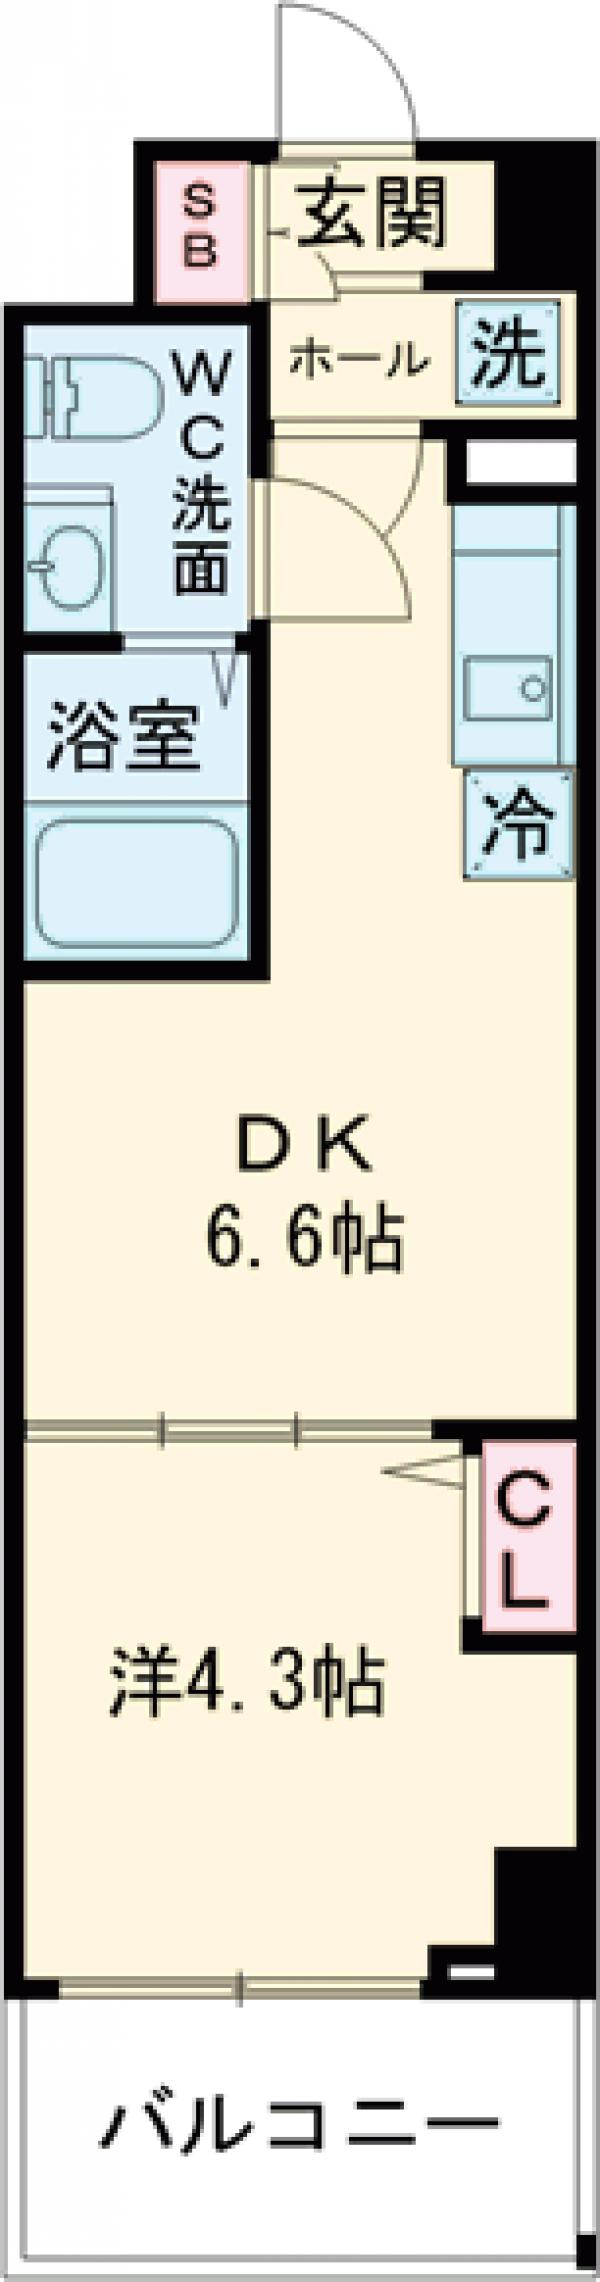 KDXレジデンス梅島・311号室の間取り